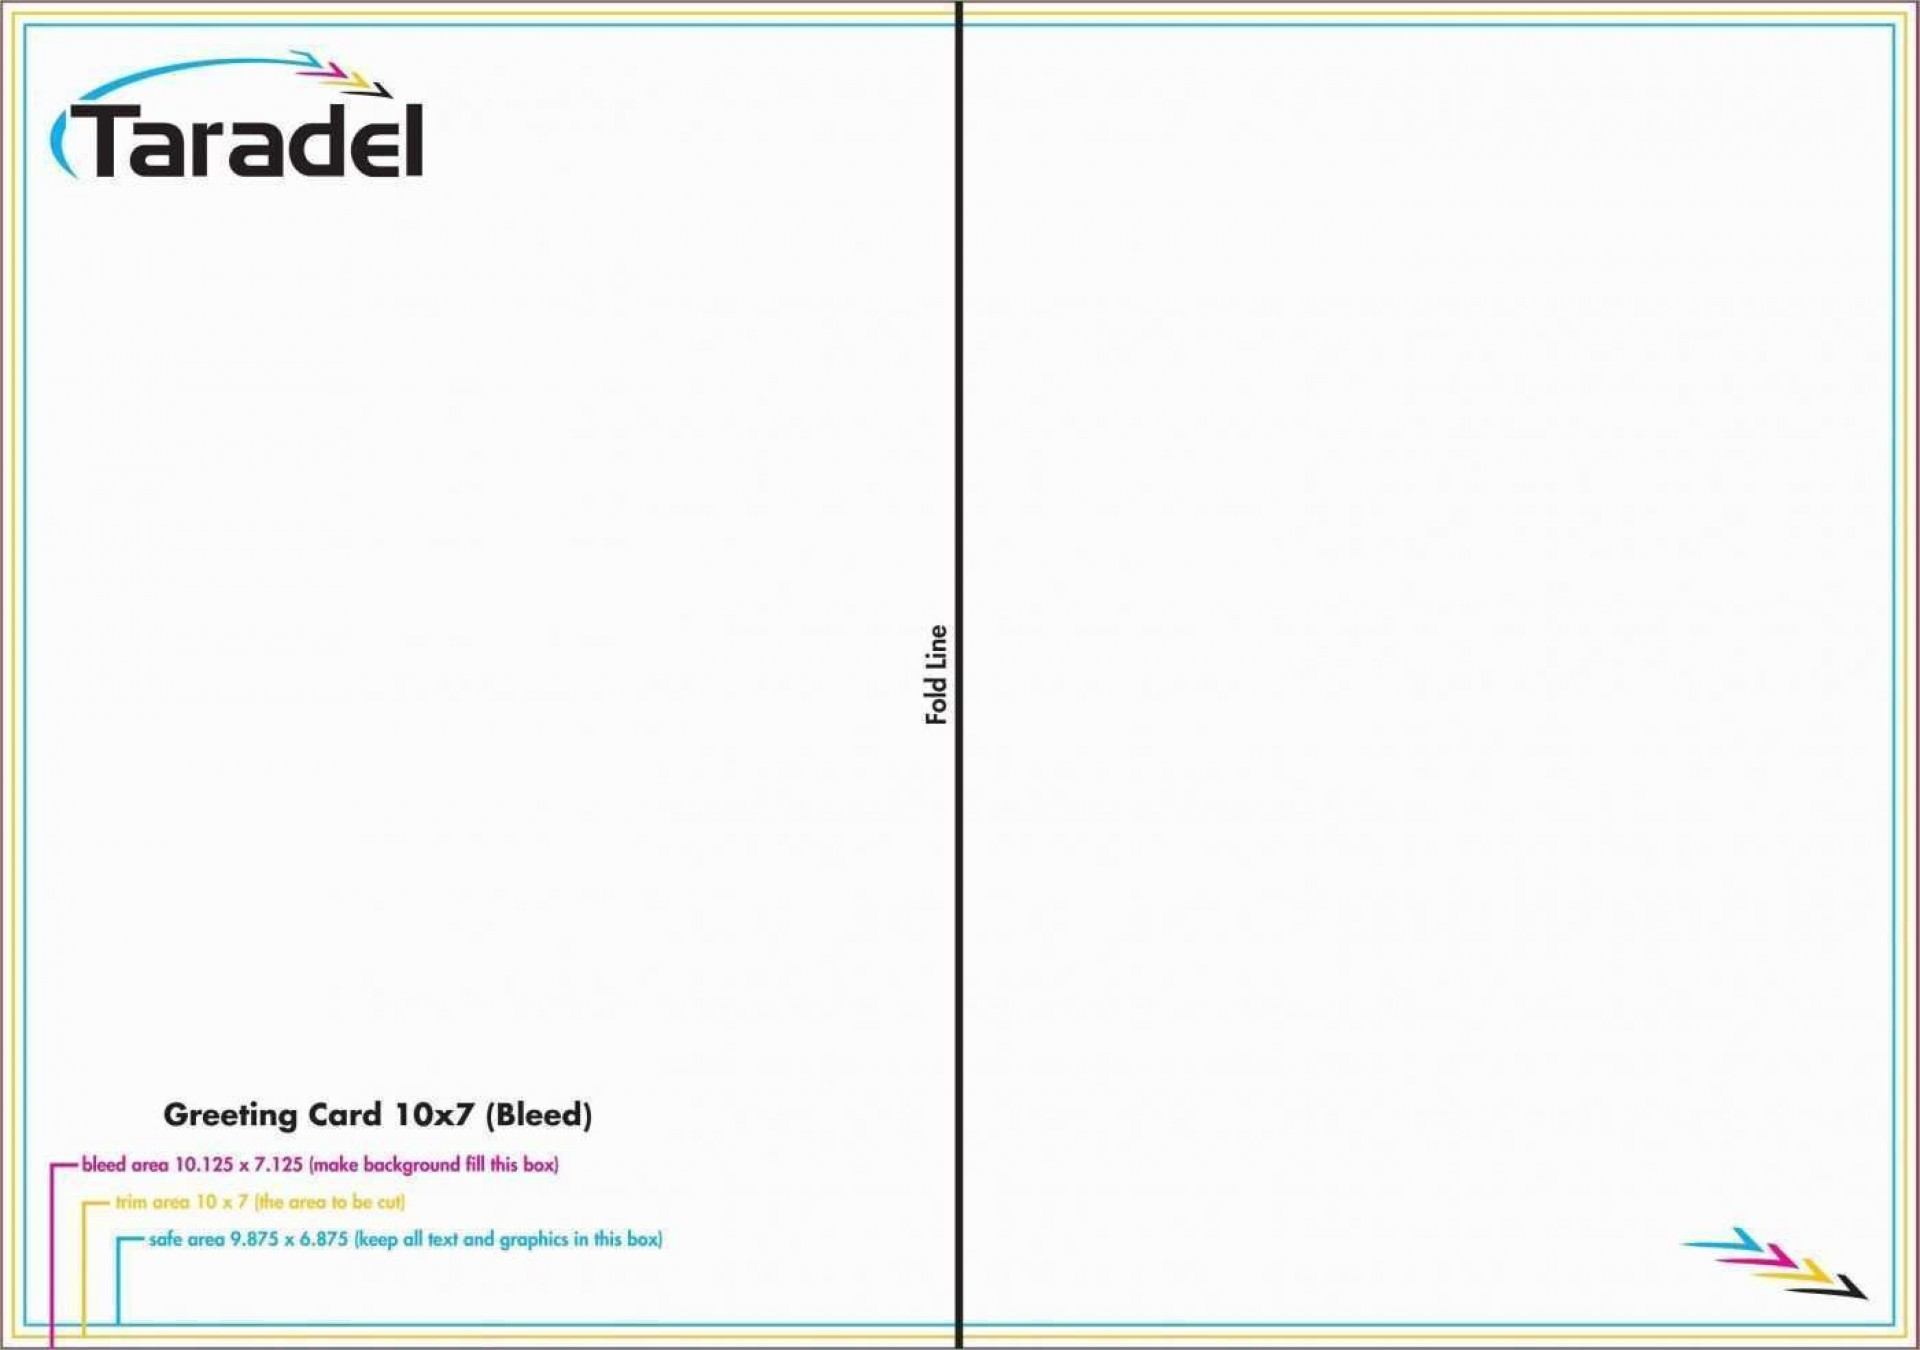 002 Wondrou Quarter Fold Greeting Card Template Word Idea 1920